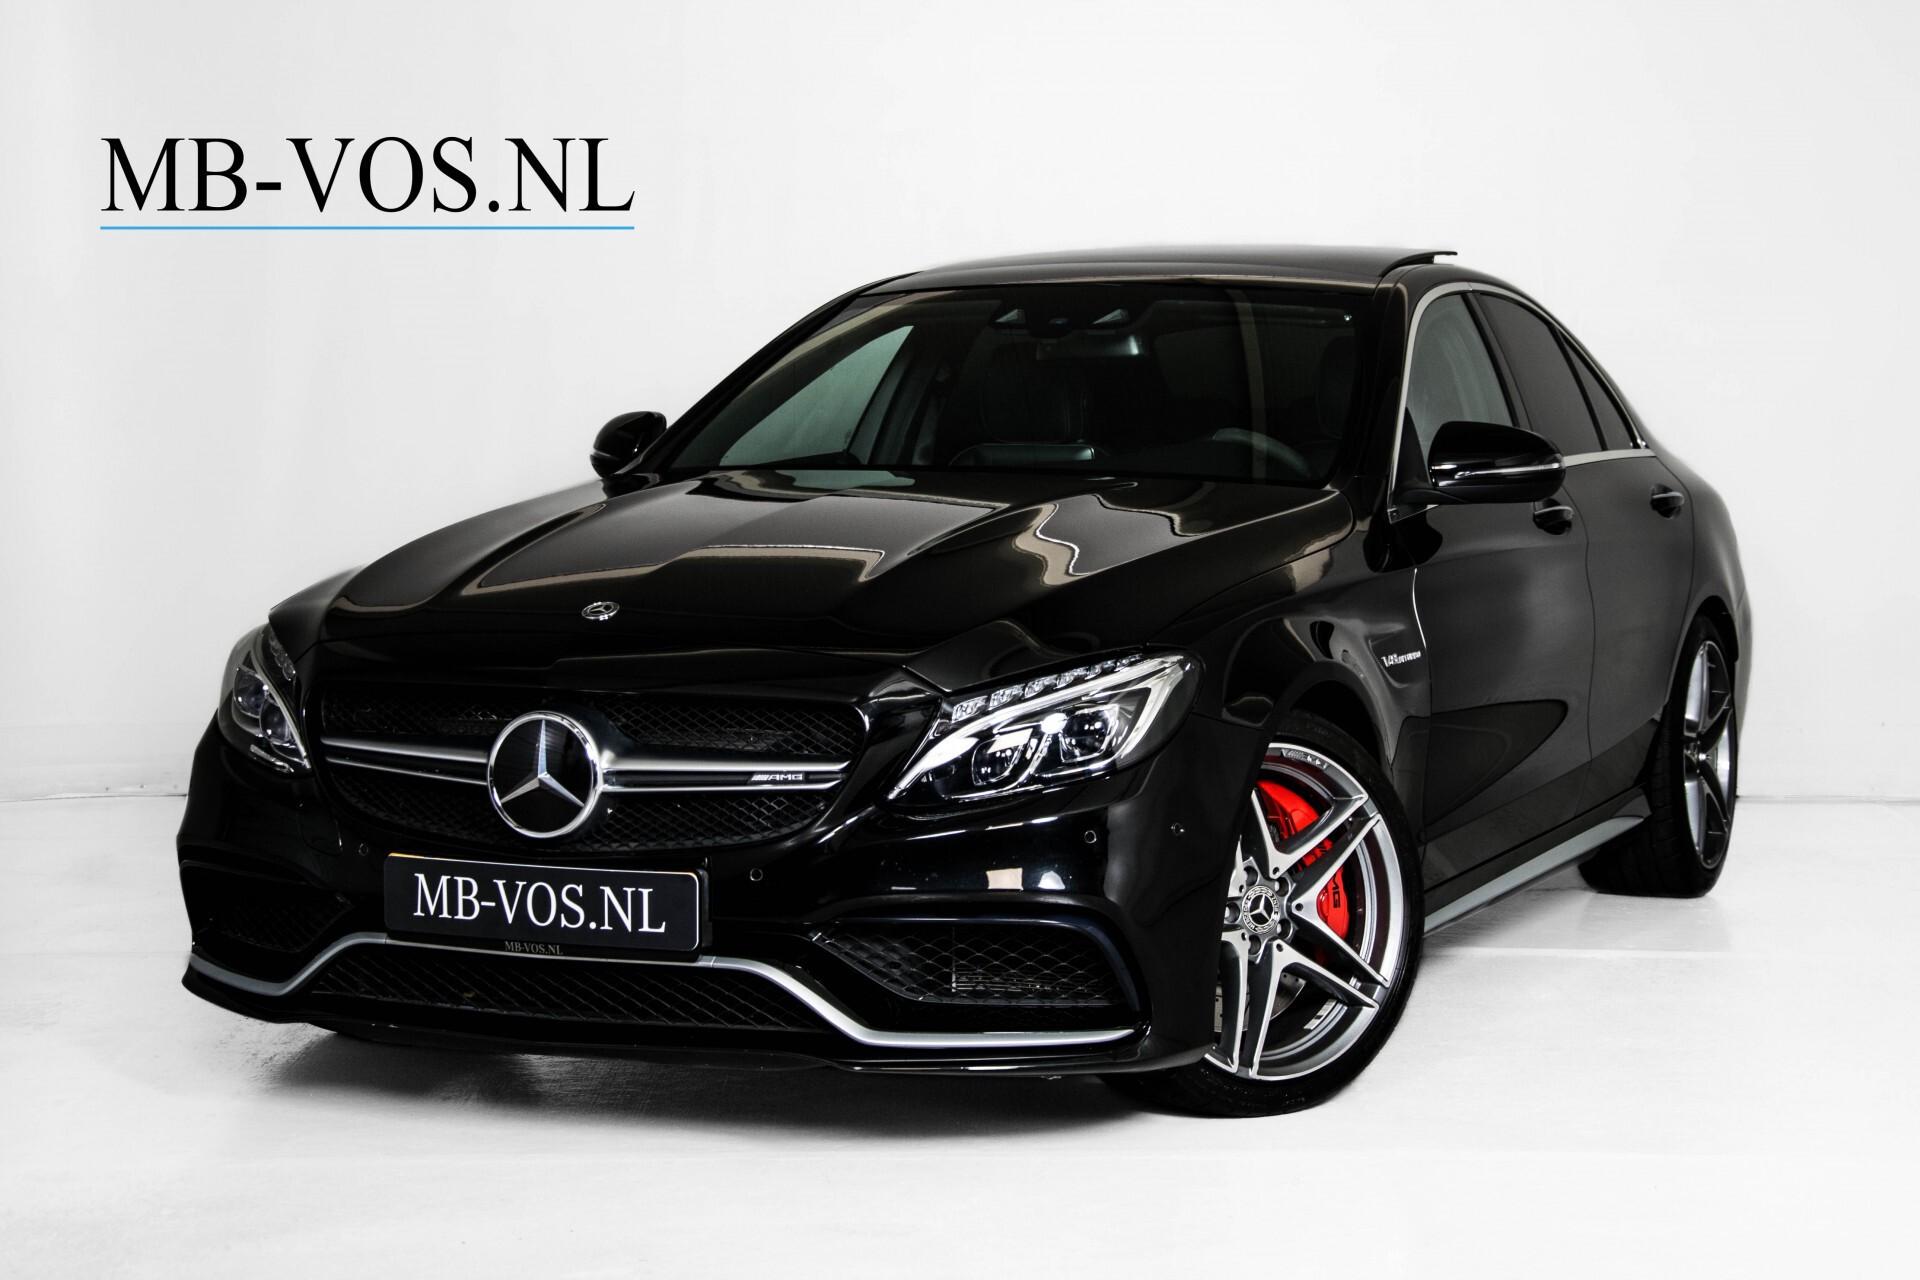 Mercedes-Benz C-Klasse 63 AMG S Panorama/Distronic/Keyless/Comand/Camera/ILS Aut7 Foto 1